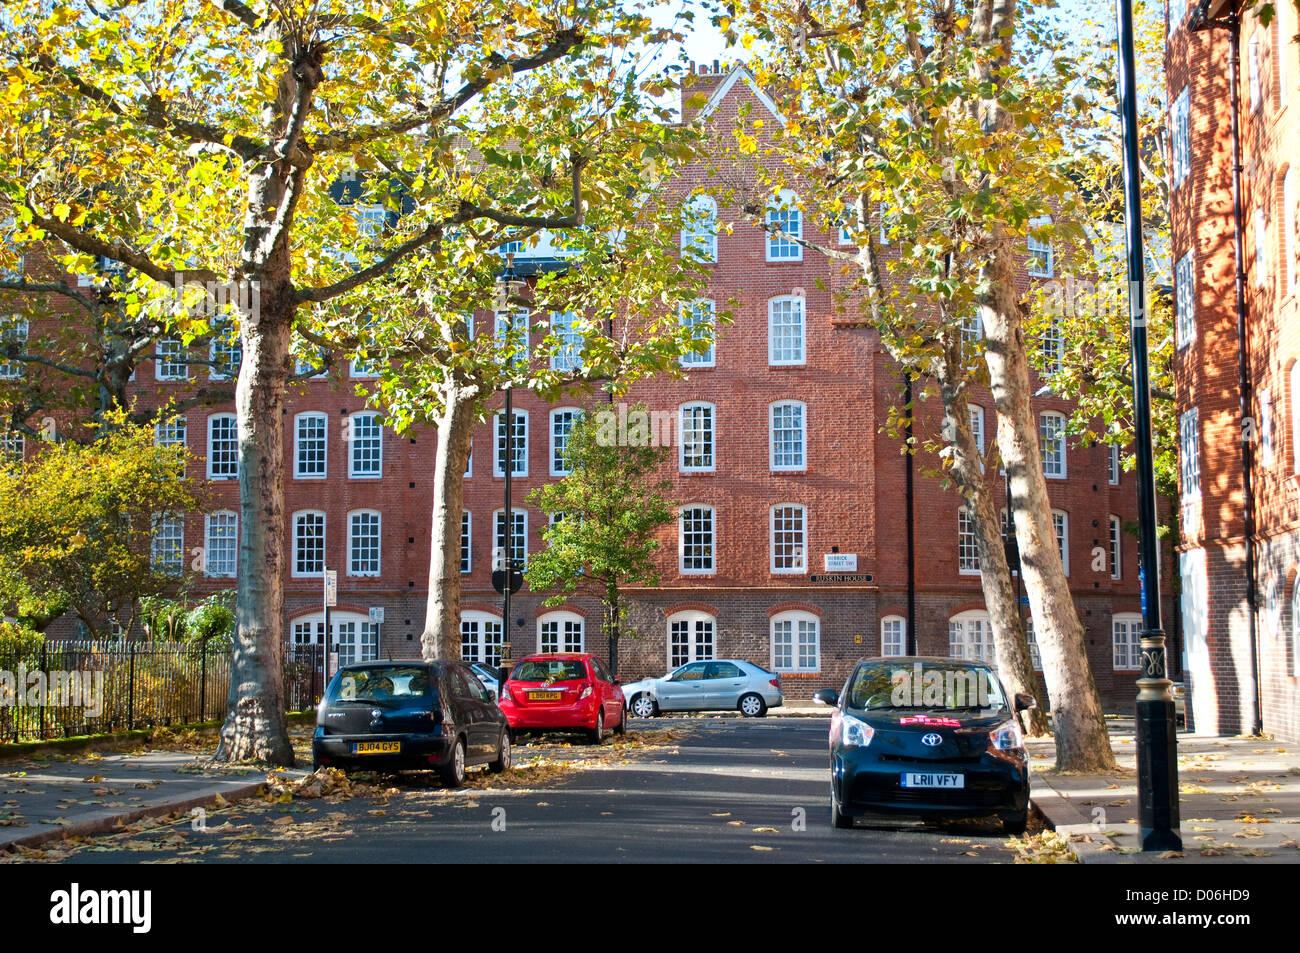 Logements sociaux, Herrick Street, SW1, City of Westminster, London, UK Banque D'Images